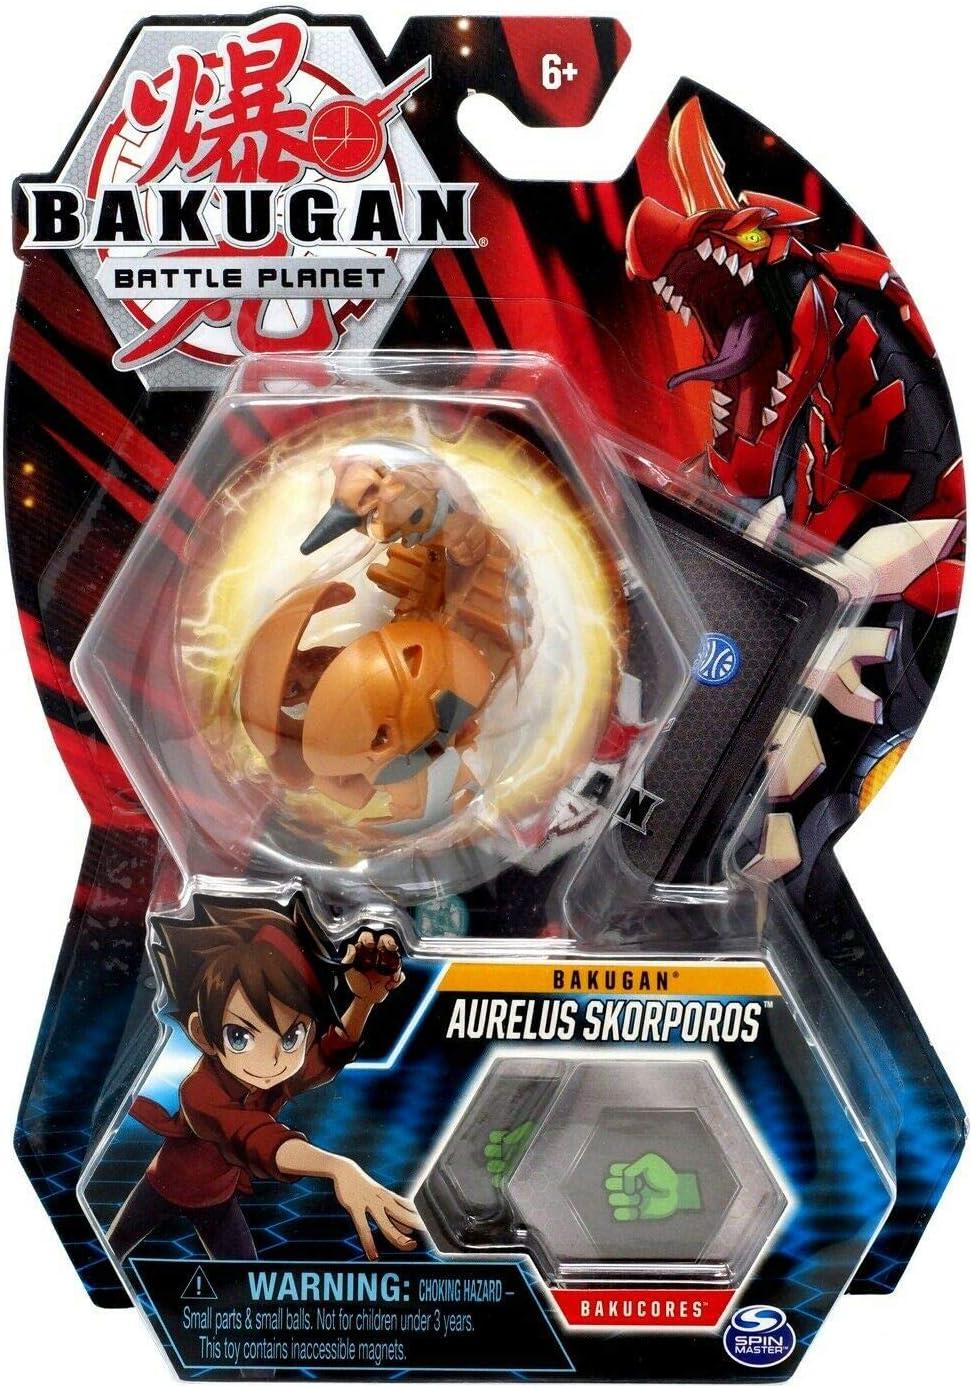 "Bakugan, Aurelus Skorporos, 2"" Tall Collectible Transforming Creature, for Ages 6 & Up"